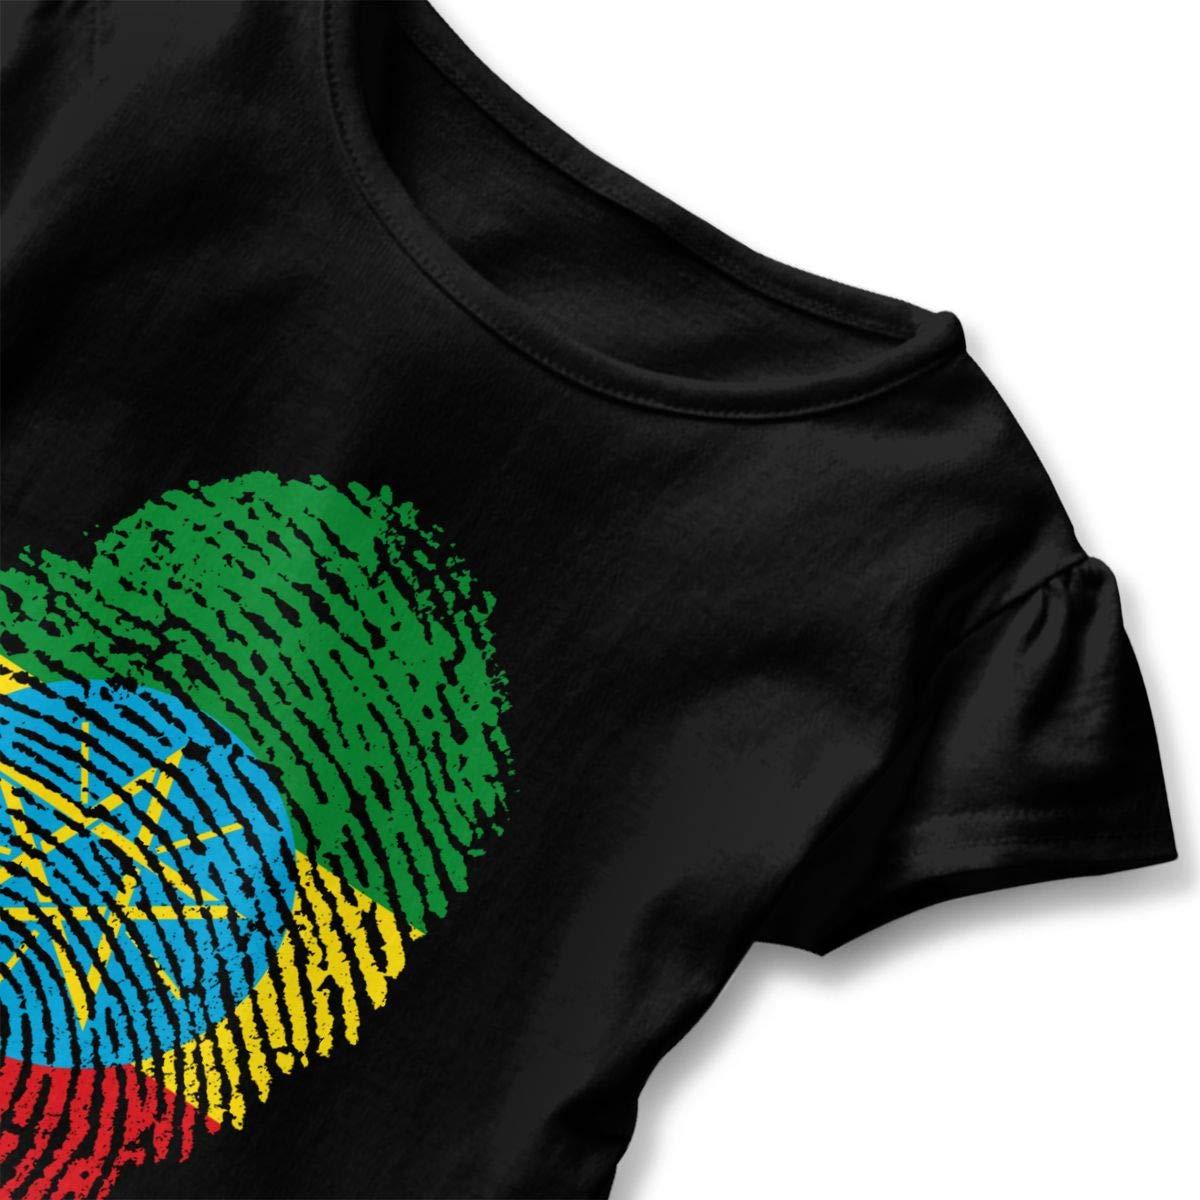 JVNSS Ethiopian DNA Shirt Printed Toddler Girls Flounced T Shirts Graphic T-Shirt for 2-6T Kids Girls